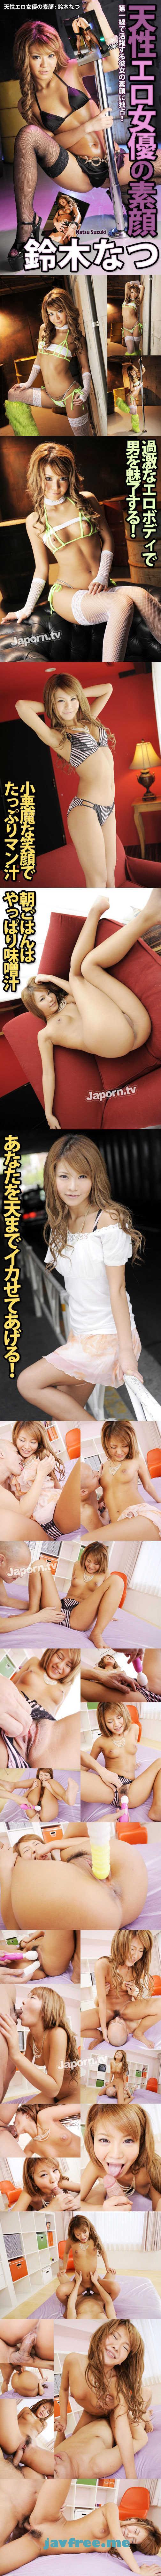 [PT-120] 天性エロ女優の素顔 : 鈴木なつ - image PT-120a on https://javfree.me